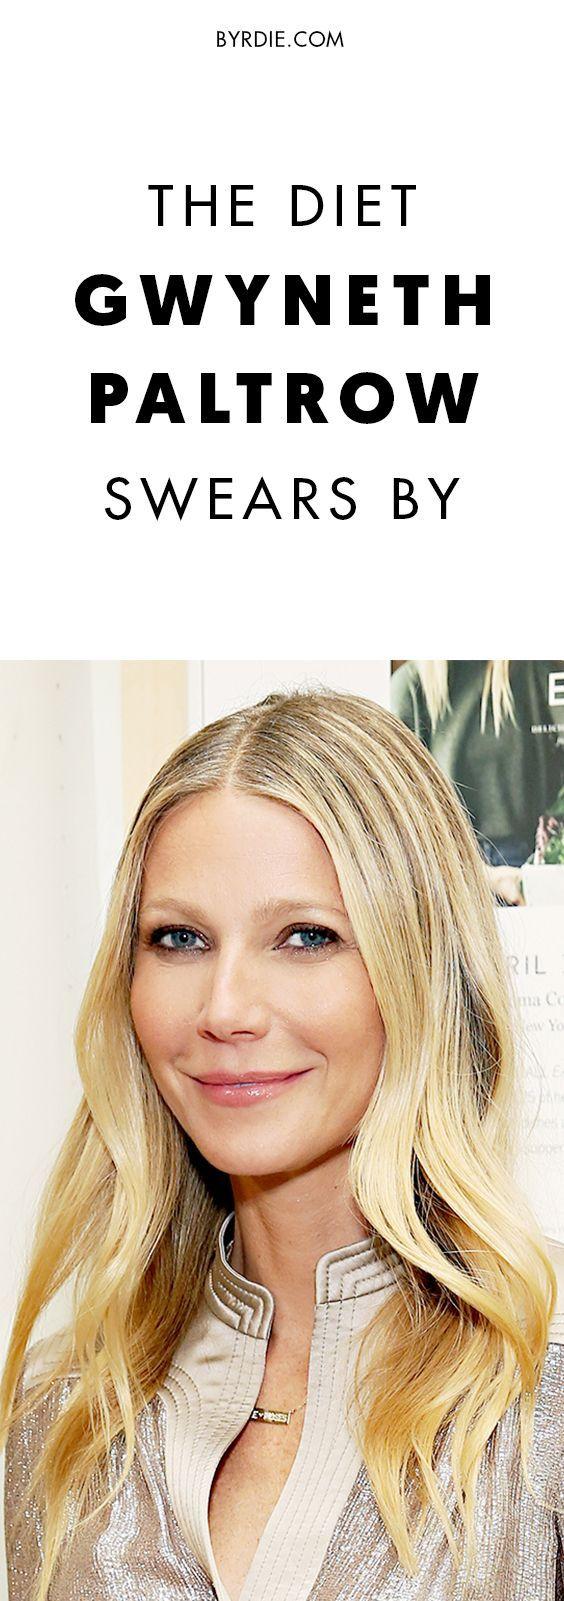 How To Eat Like Gwyneth Paltrow #CelebrityDiets In 2019